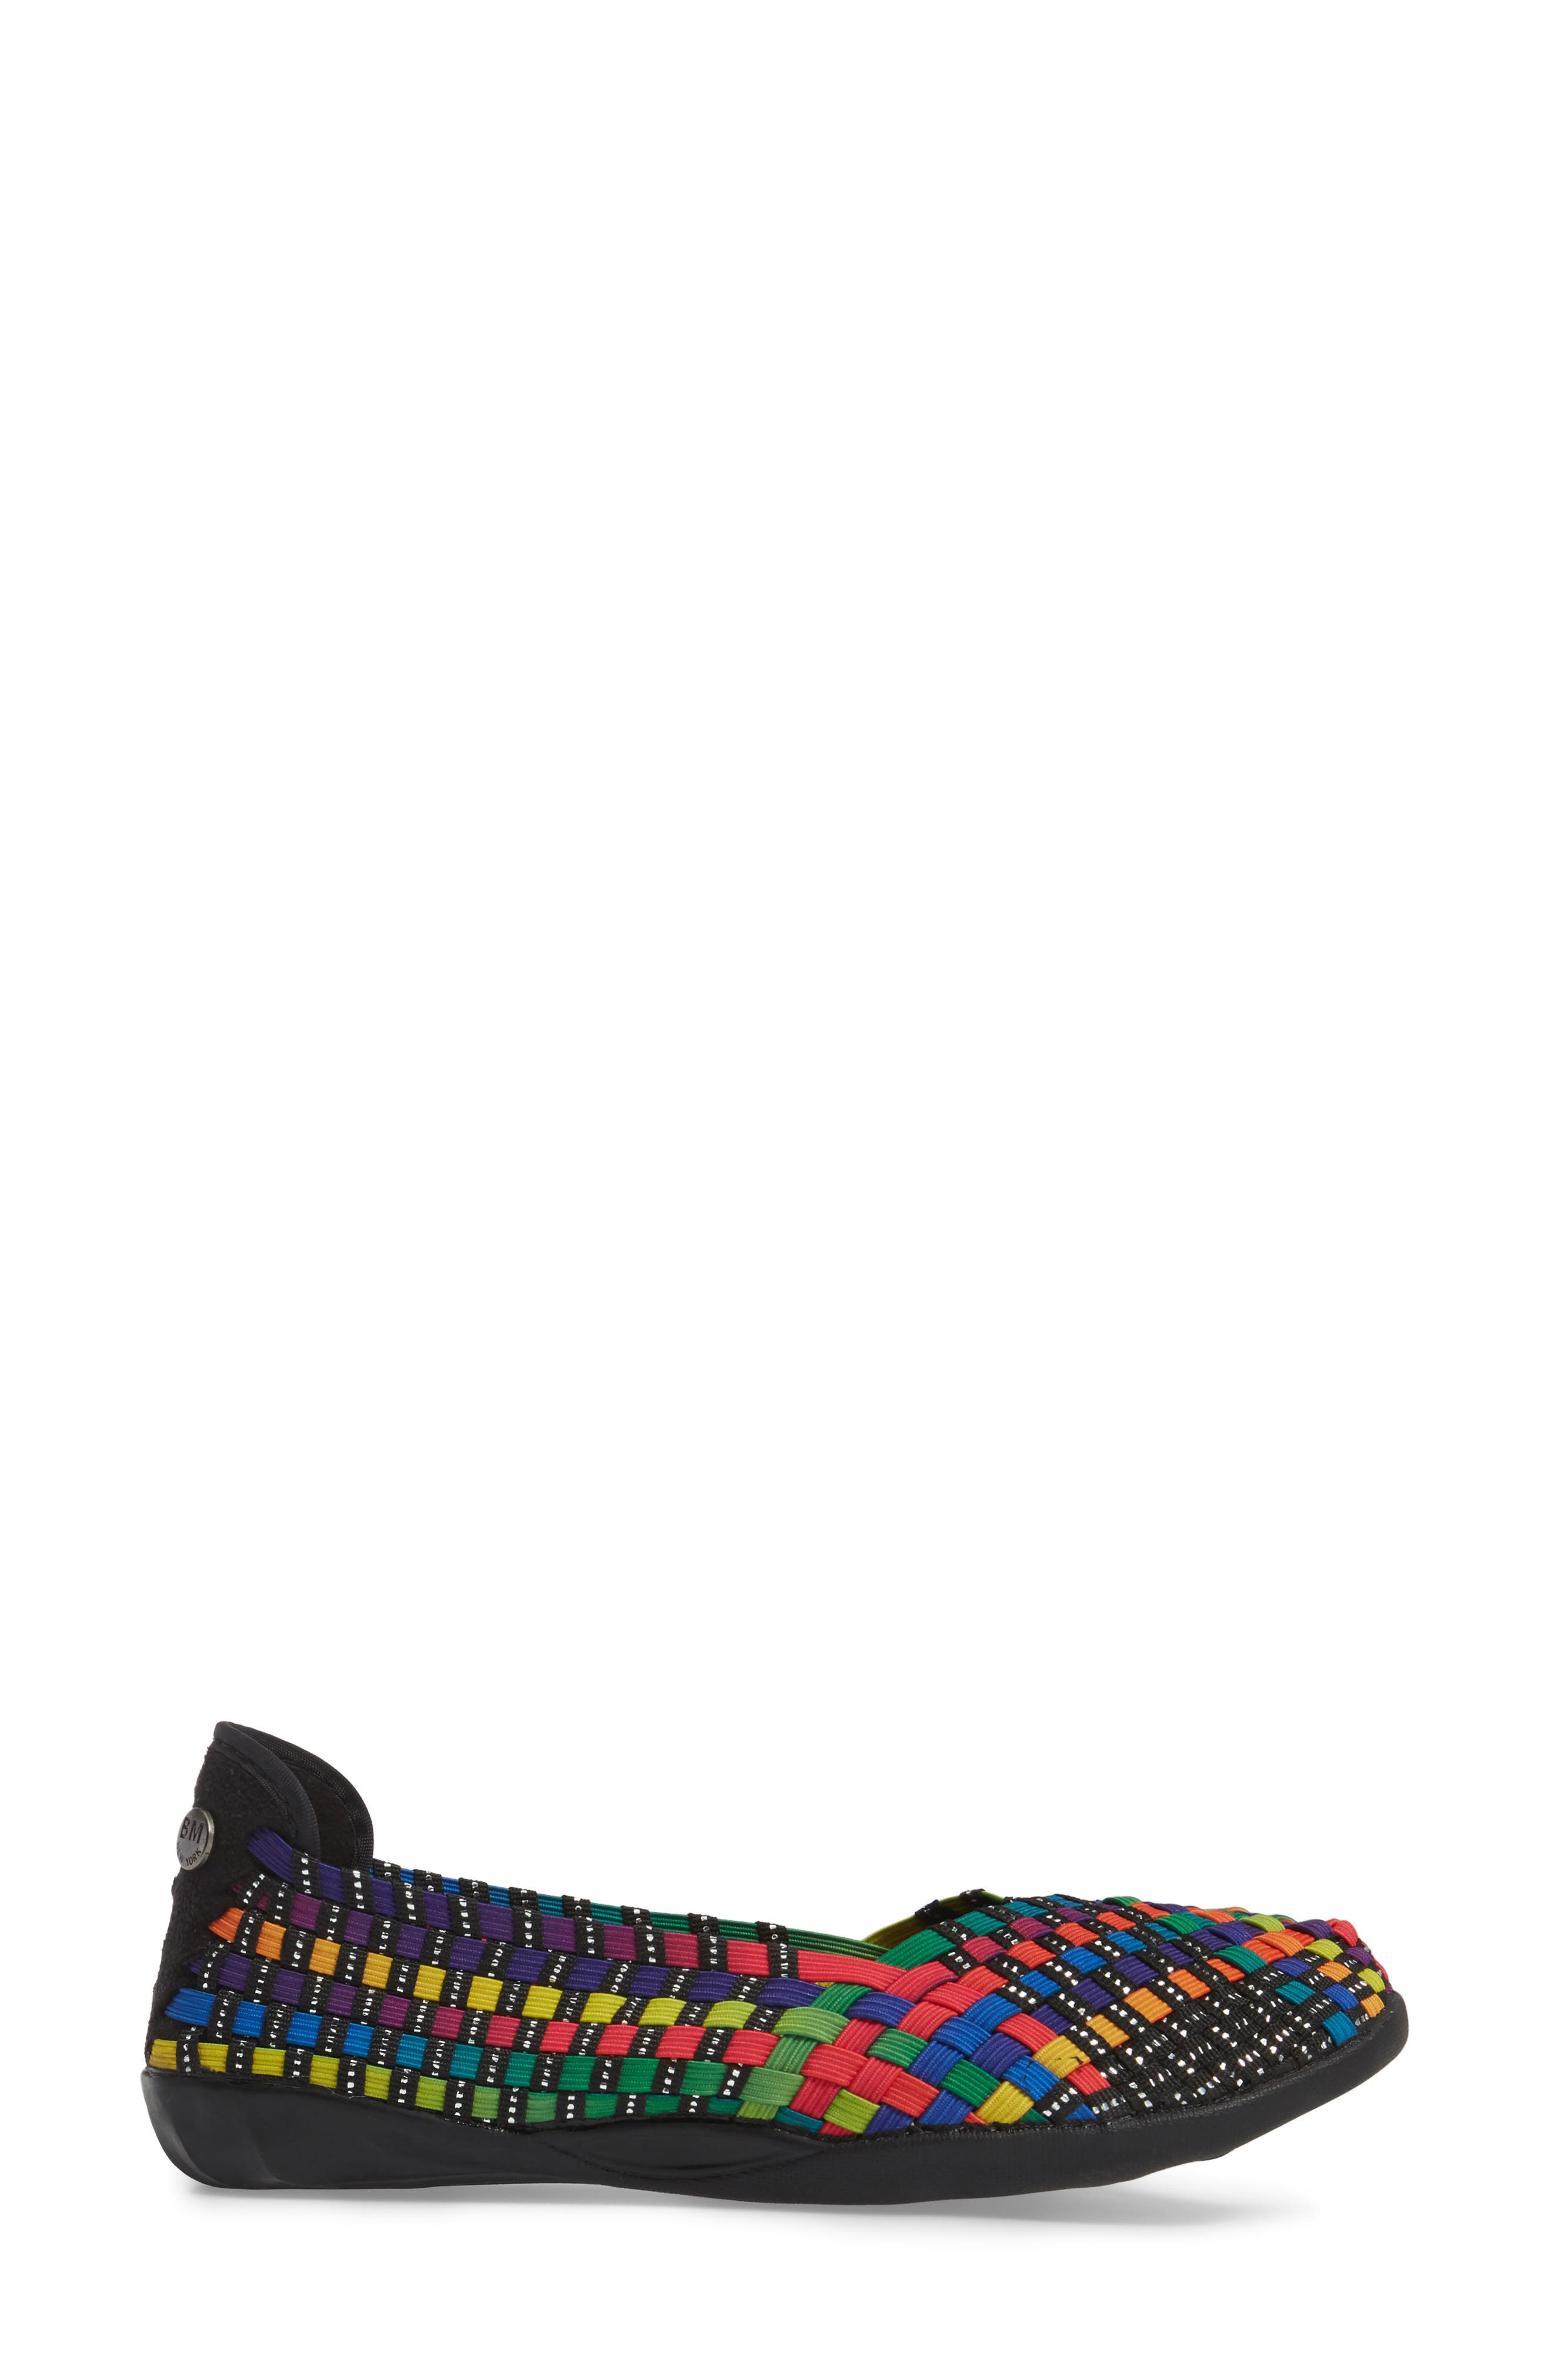 Catwalk Sneaker,                             Alternate thumbnail 3, color,                             Black Multi